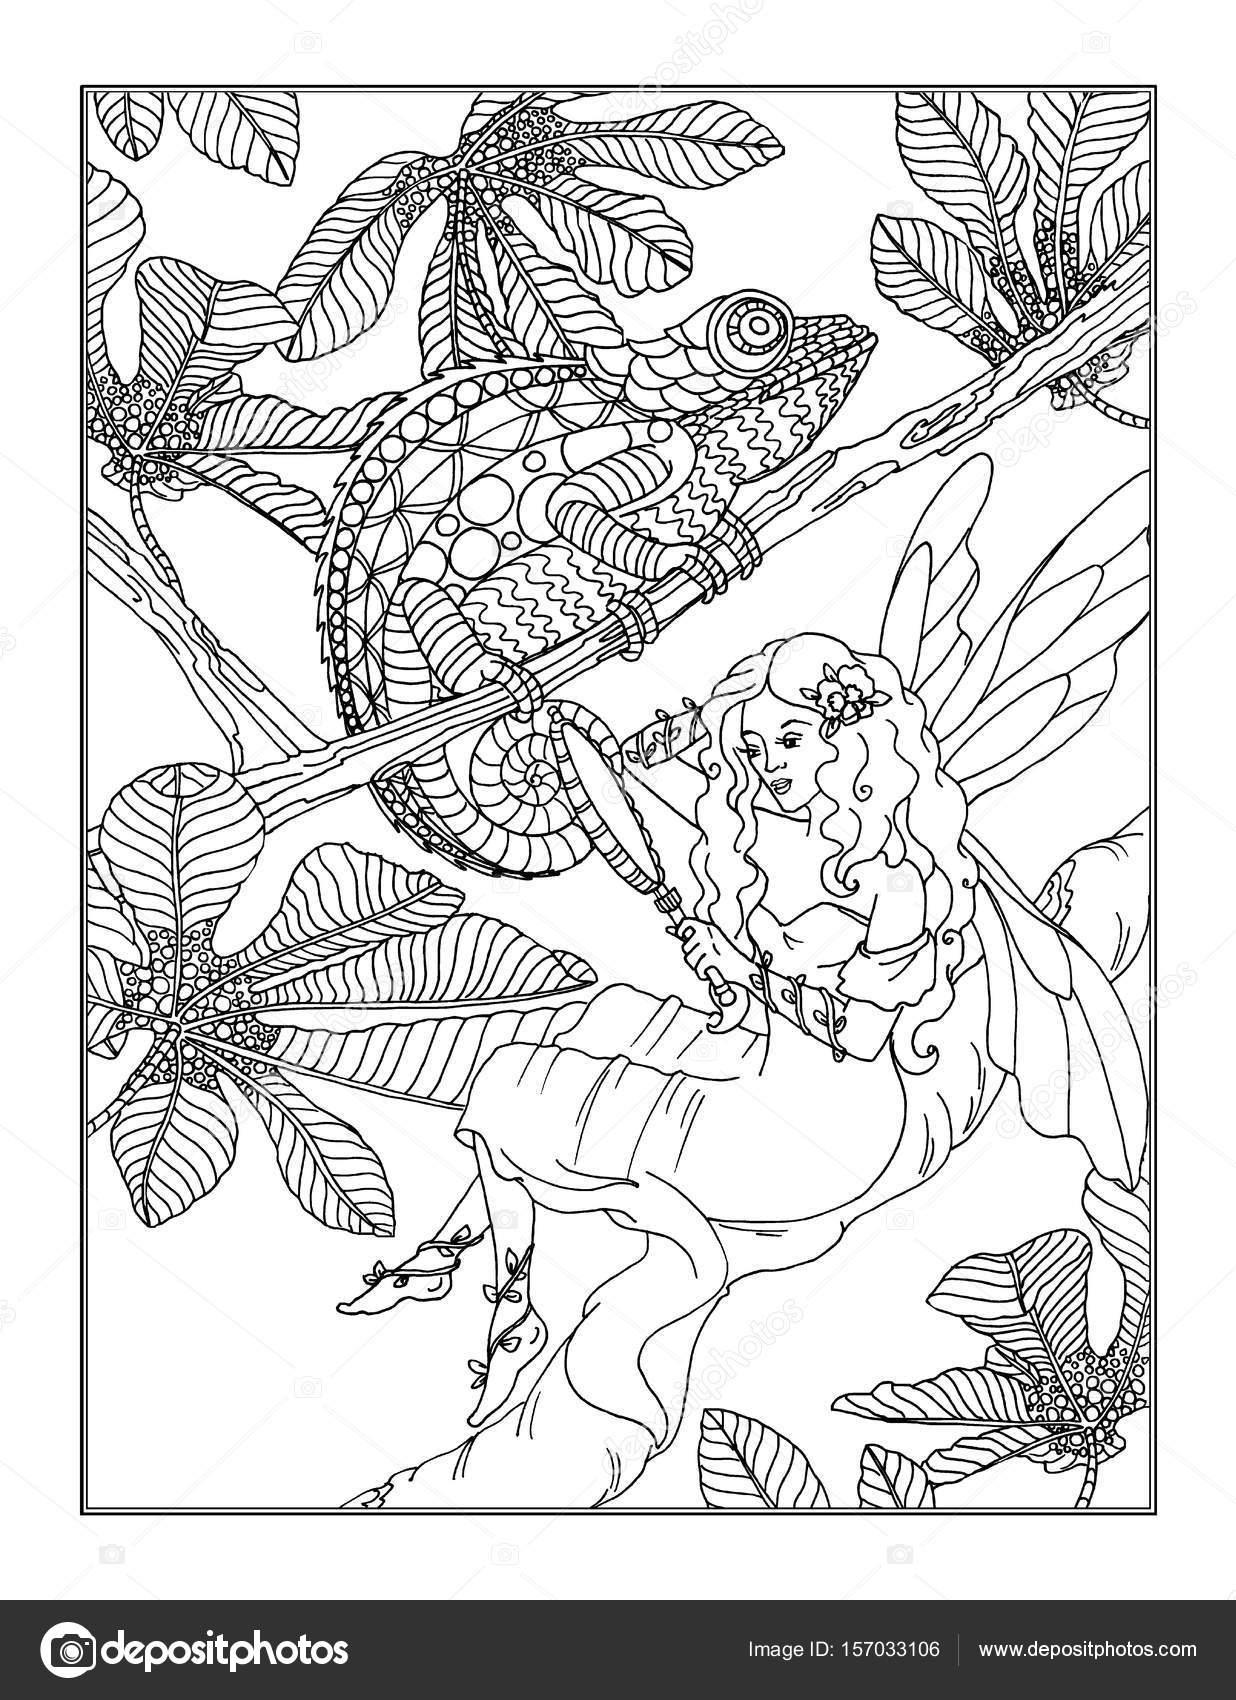 Boyama Sayfası Peri Stok Foto Larisakuzovkova 157033106